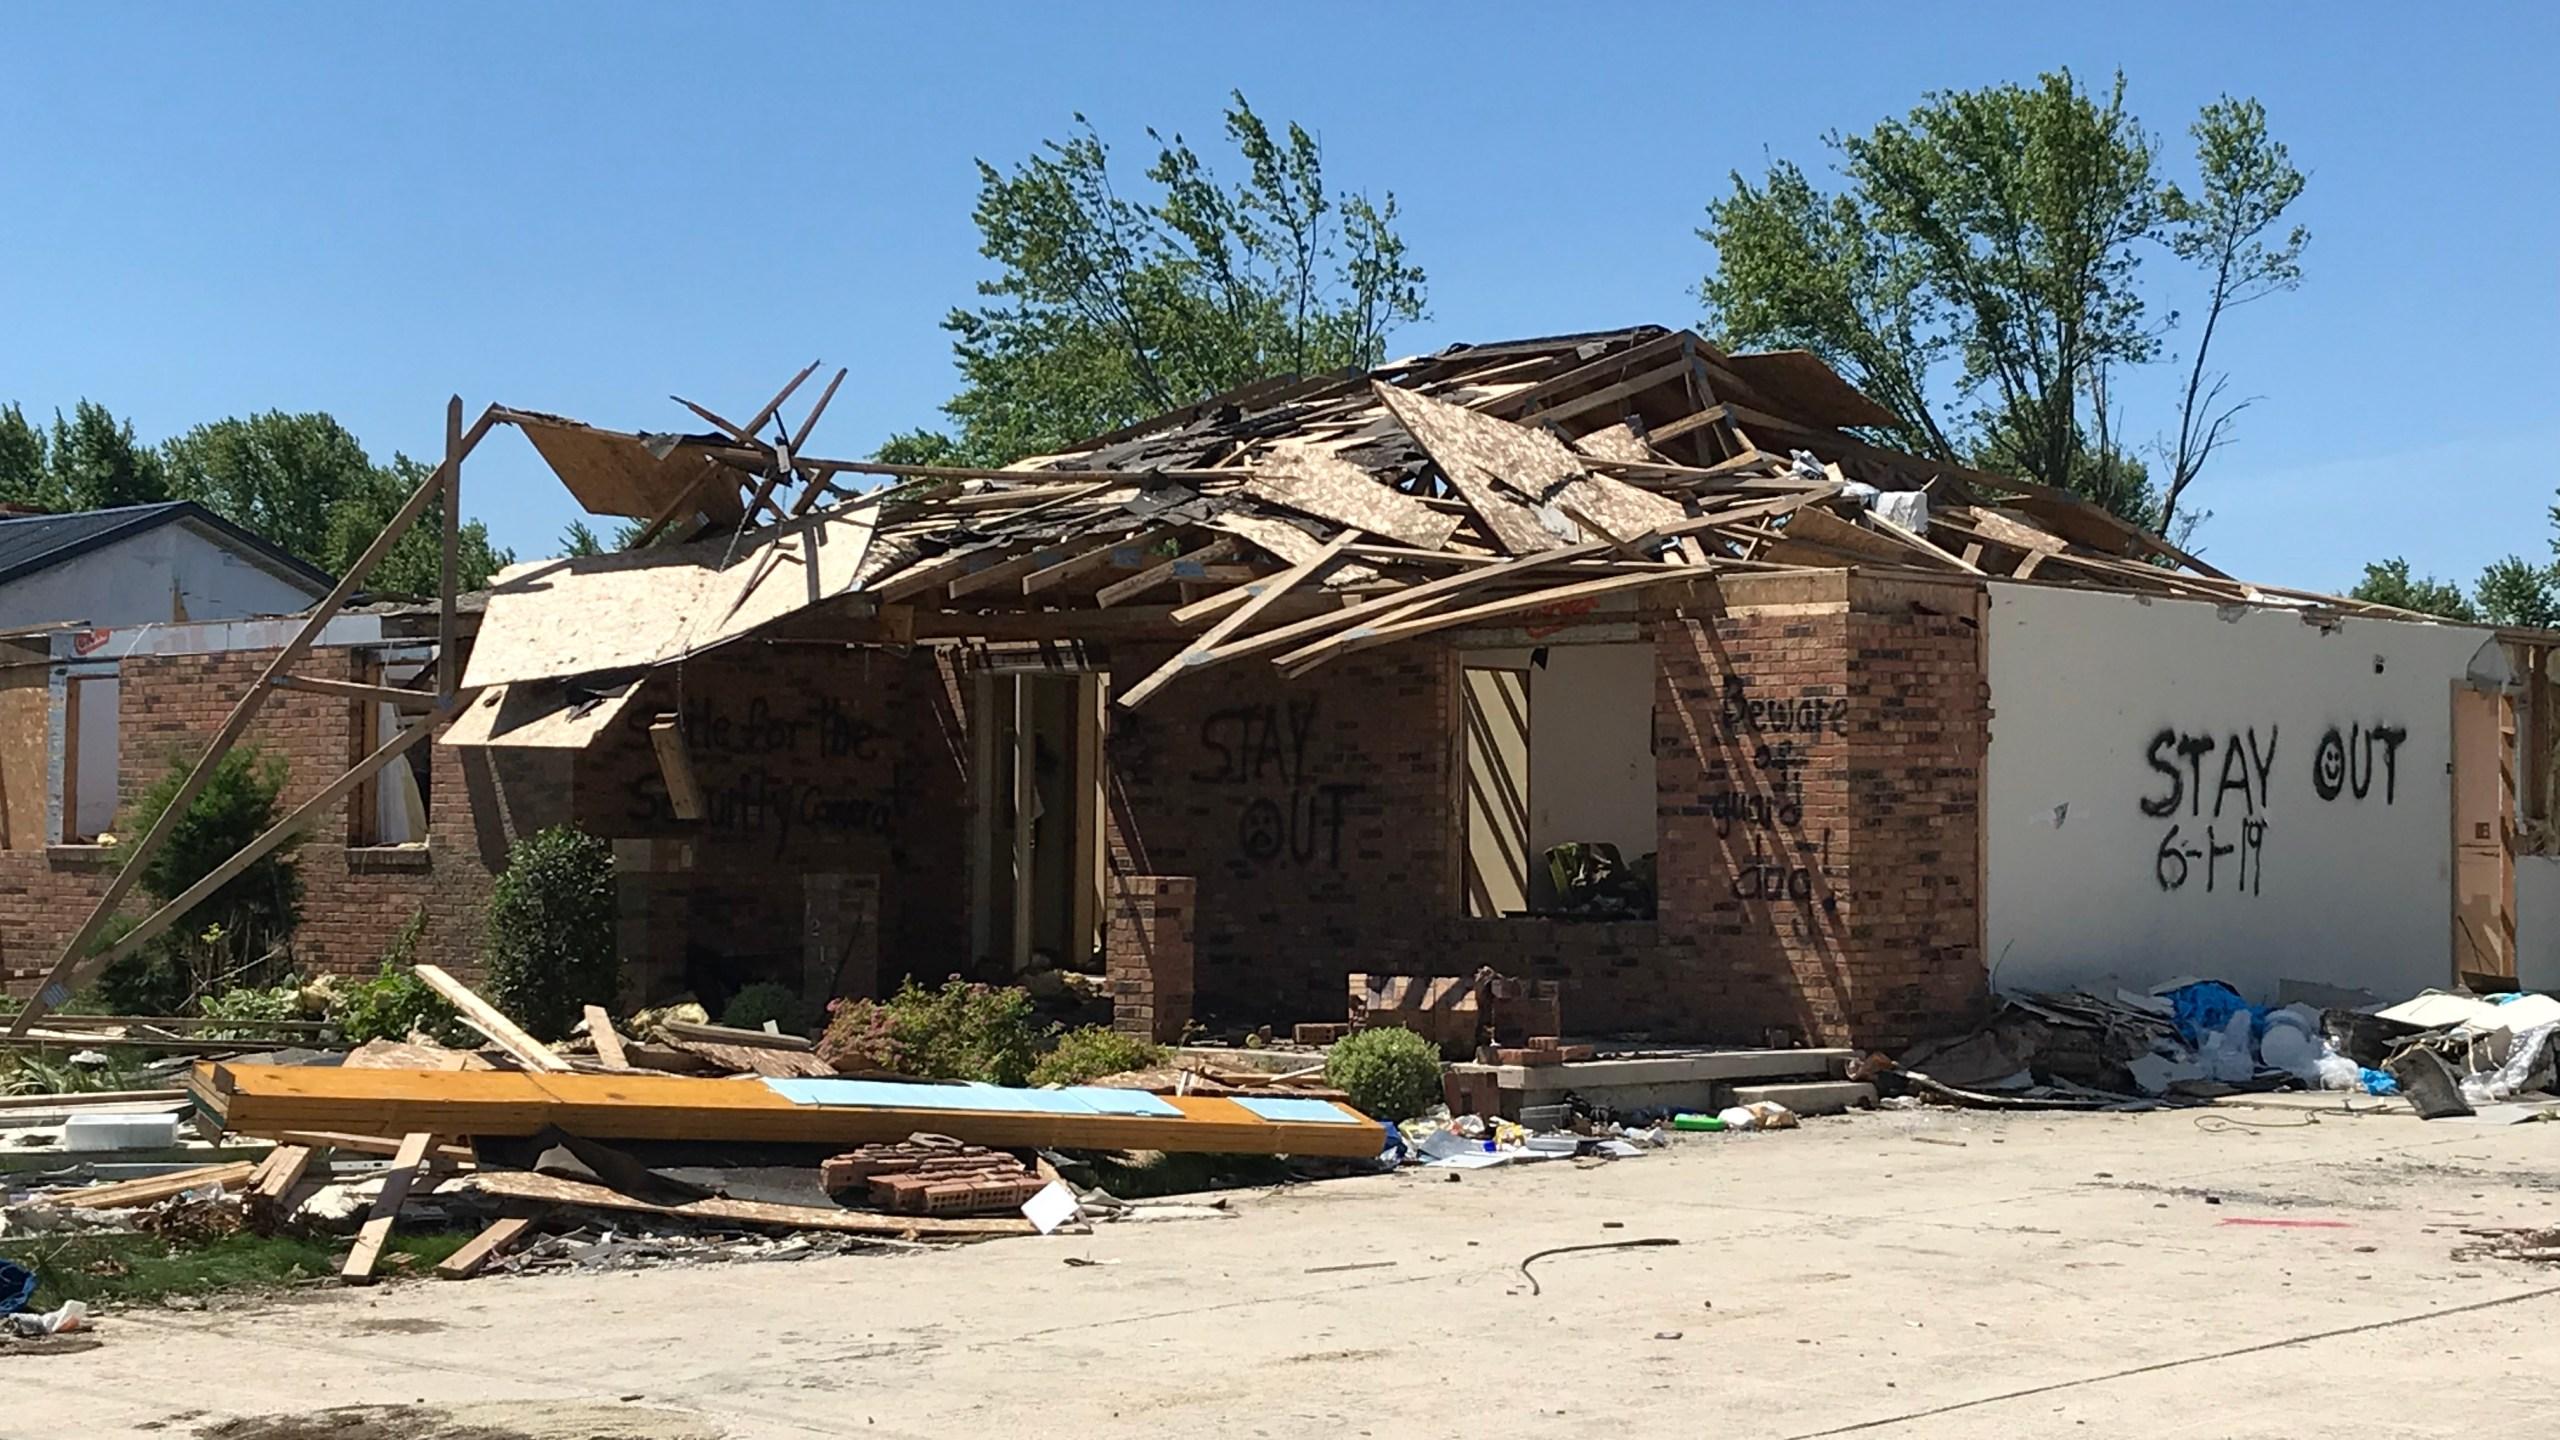 061419 celina tornado leftovers